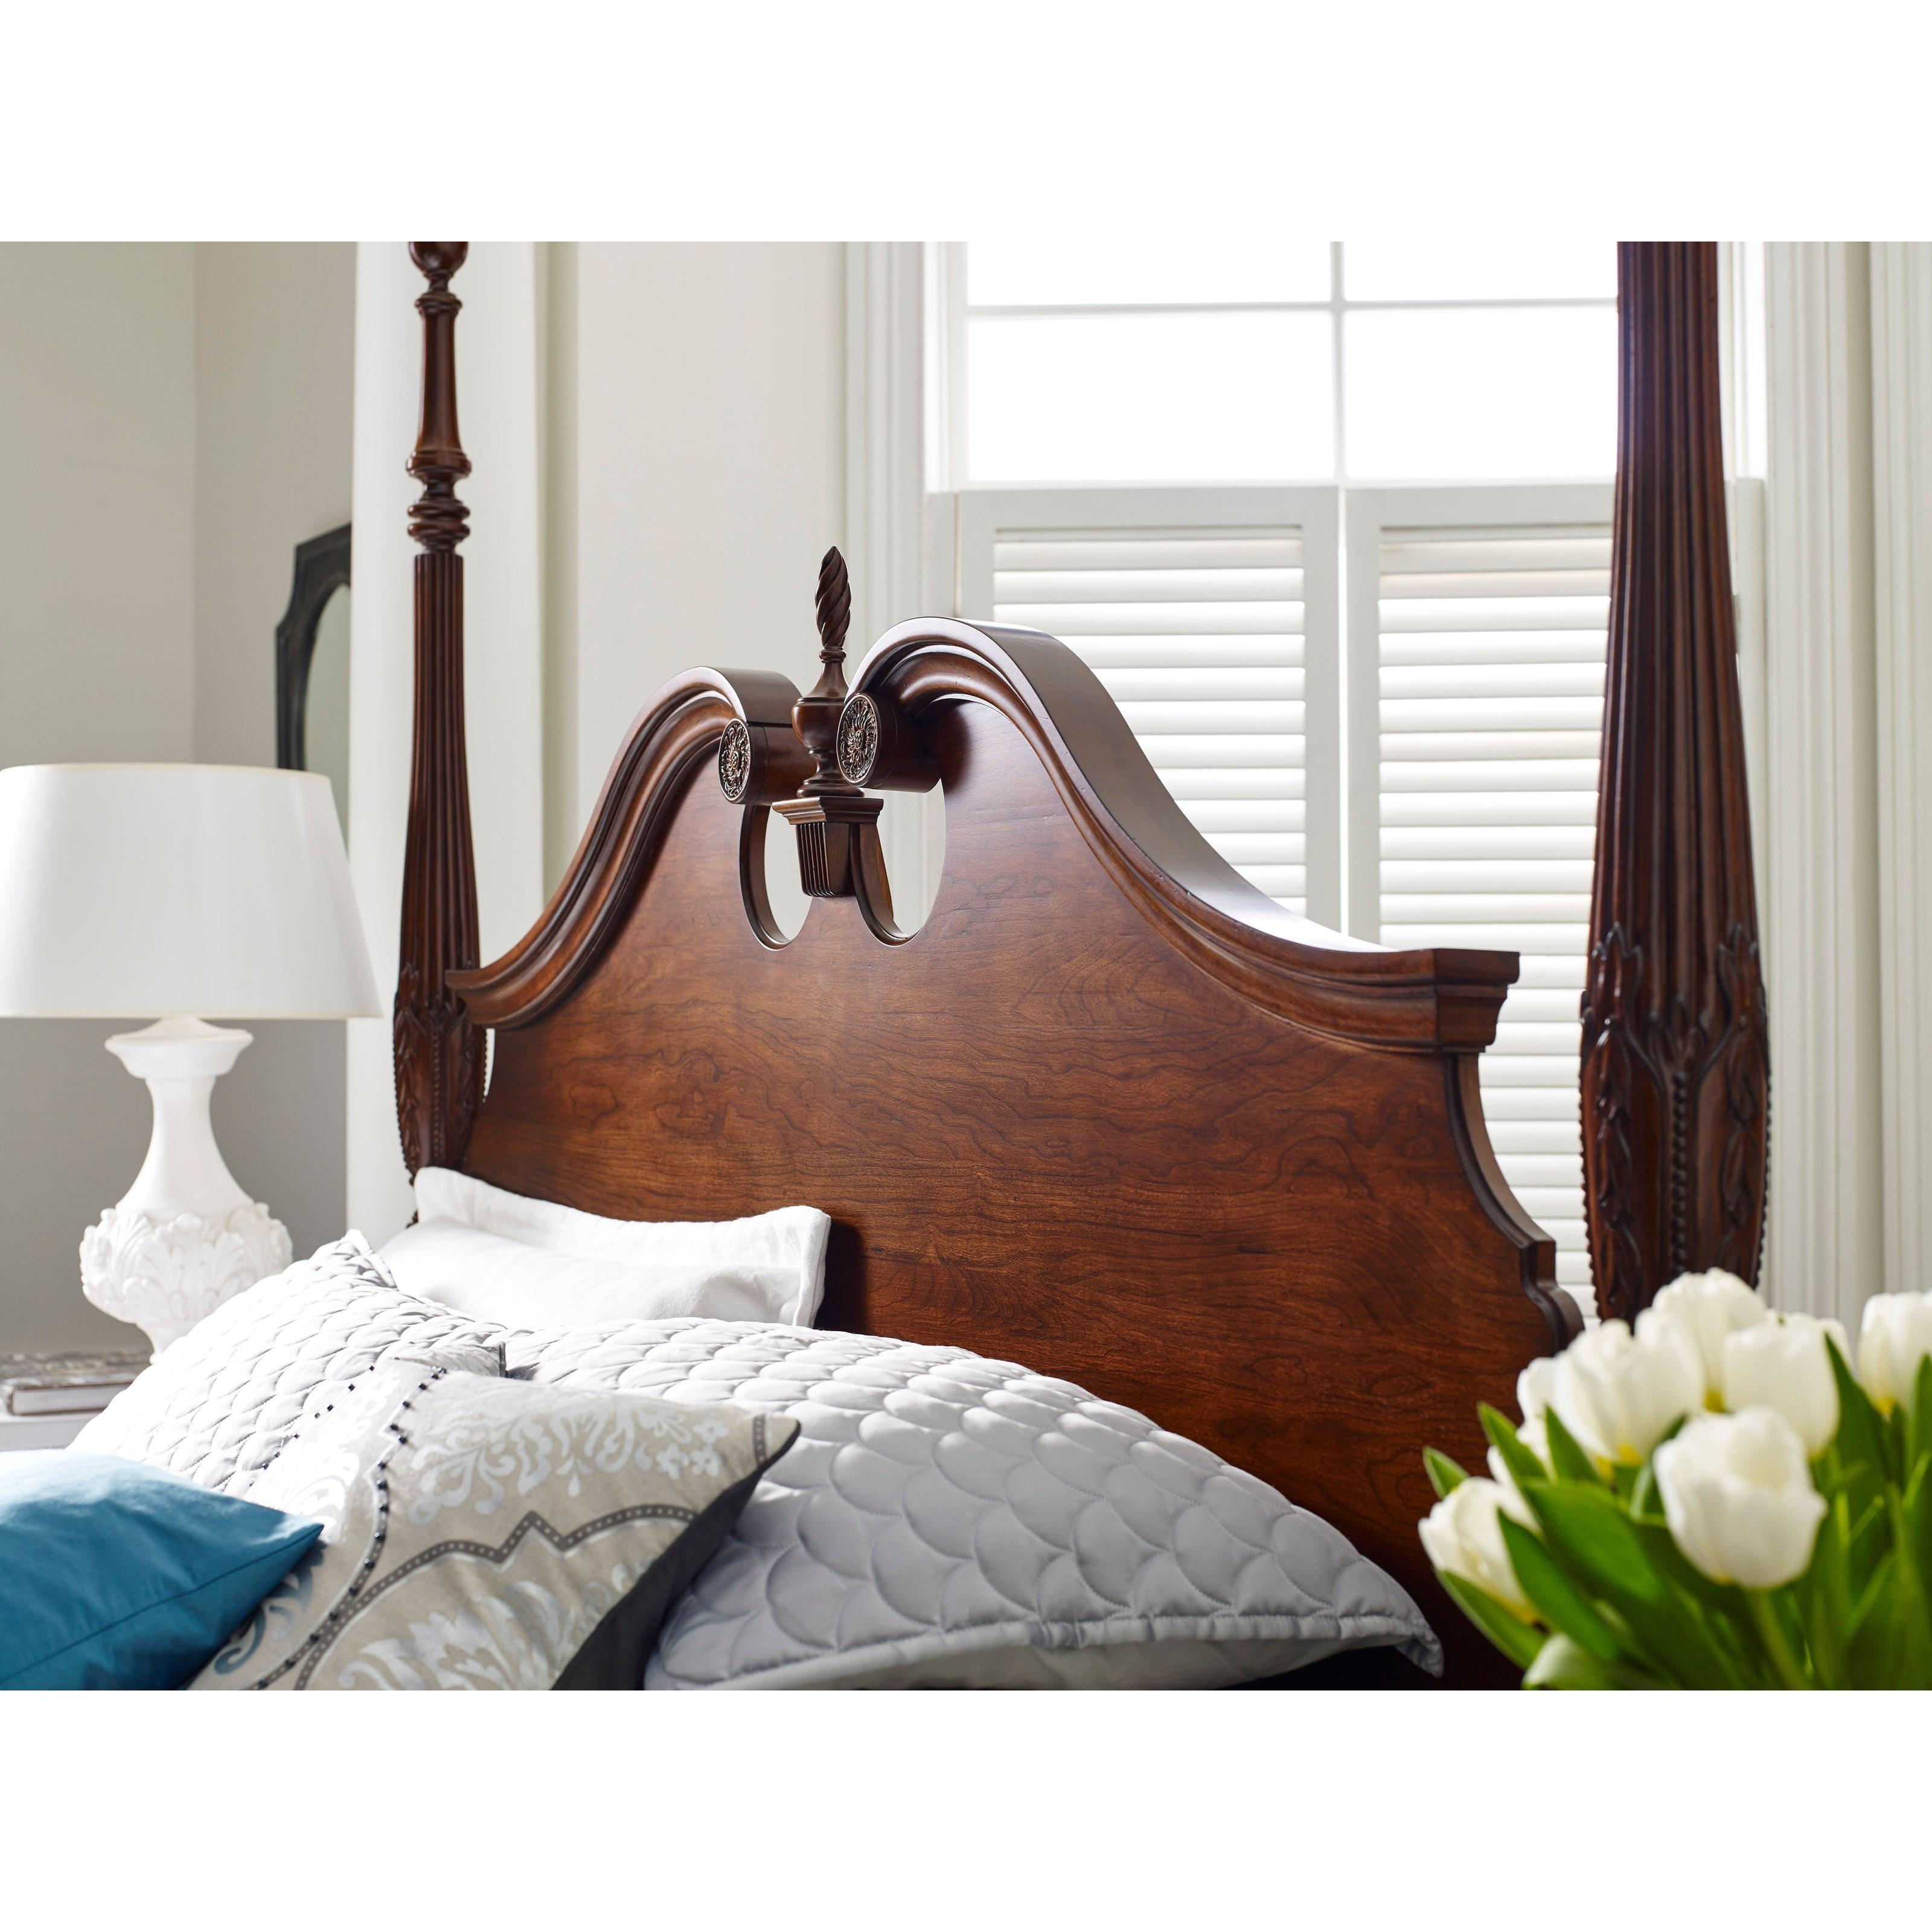 Kijiji Calgary Bedroom Furniture Kincaid Cherry Bedroom Set Kincaid 5 Piece Cherry Solid Wood